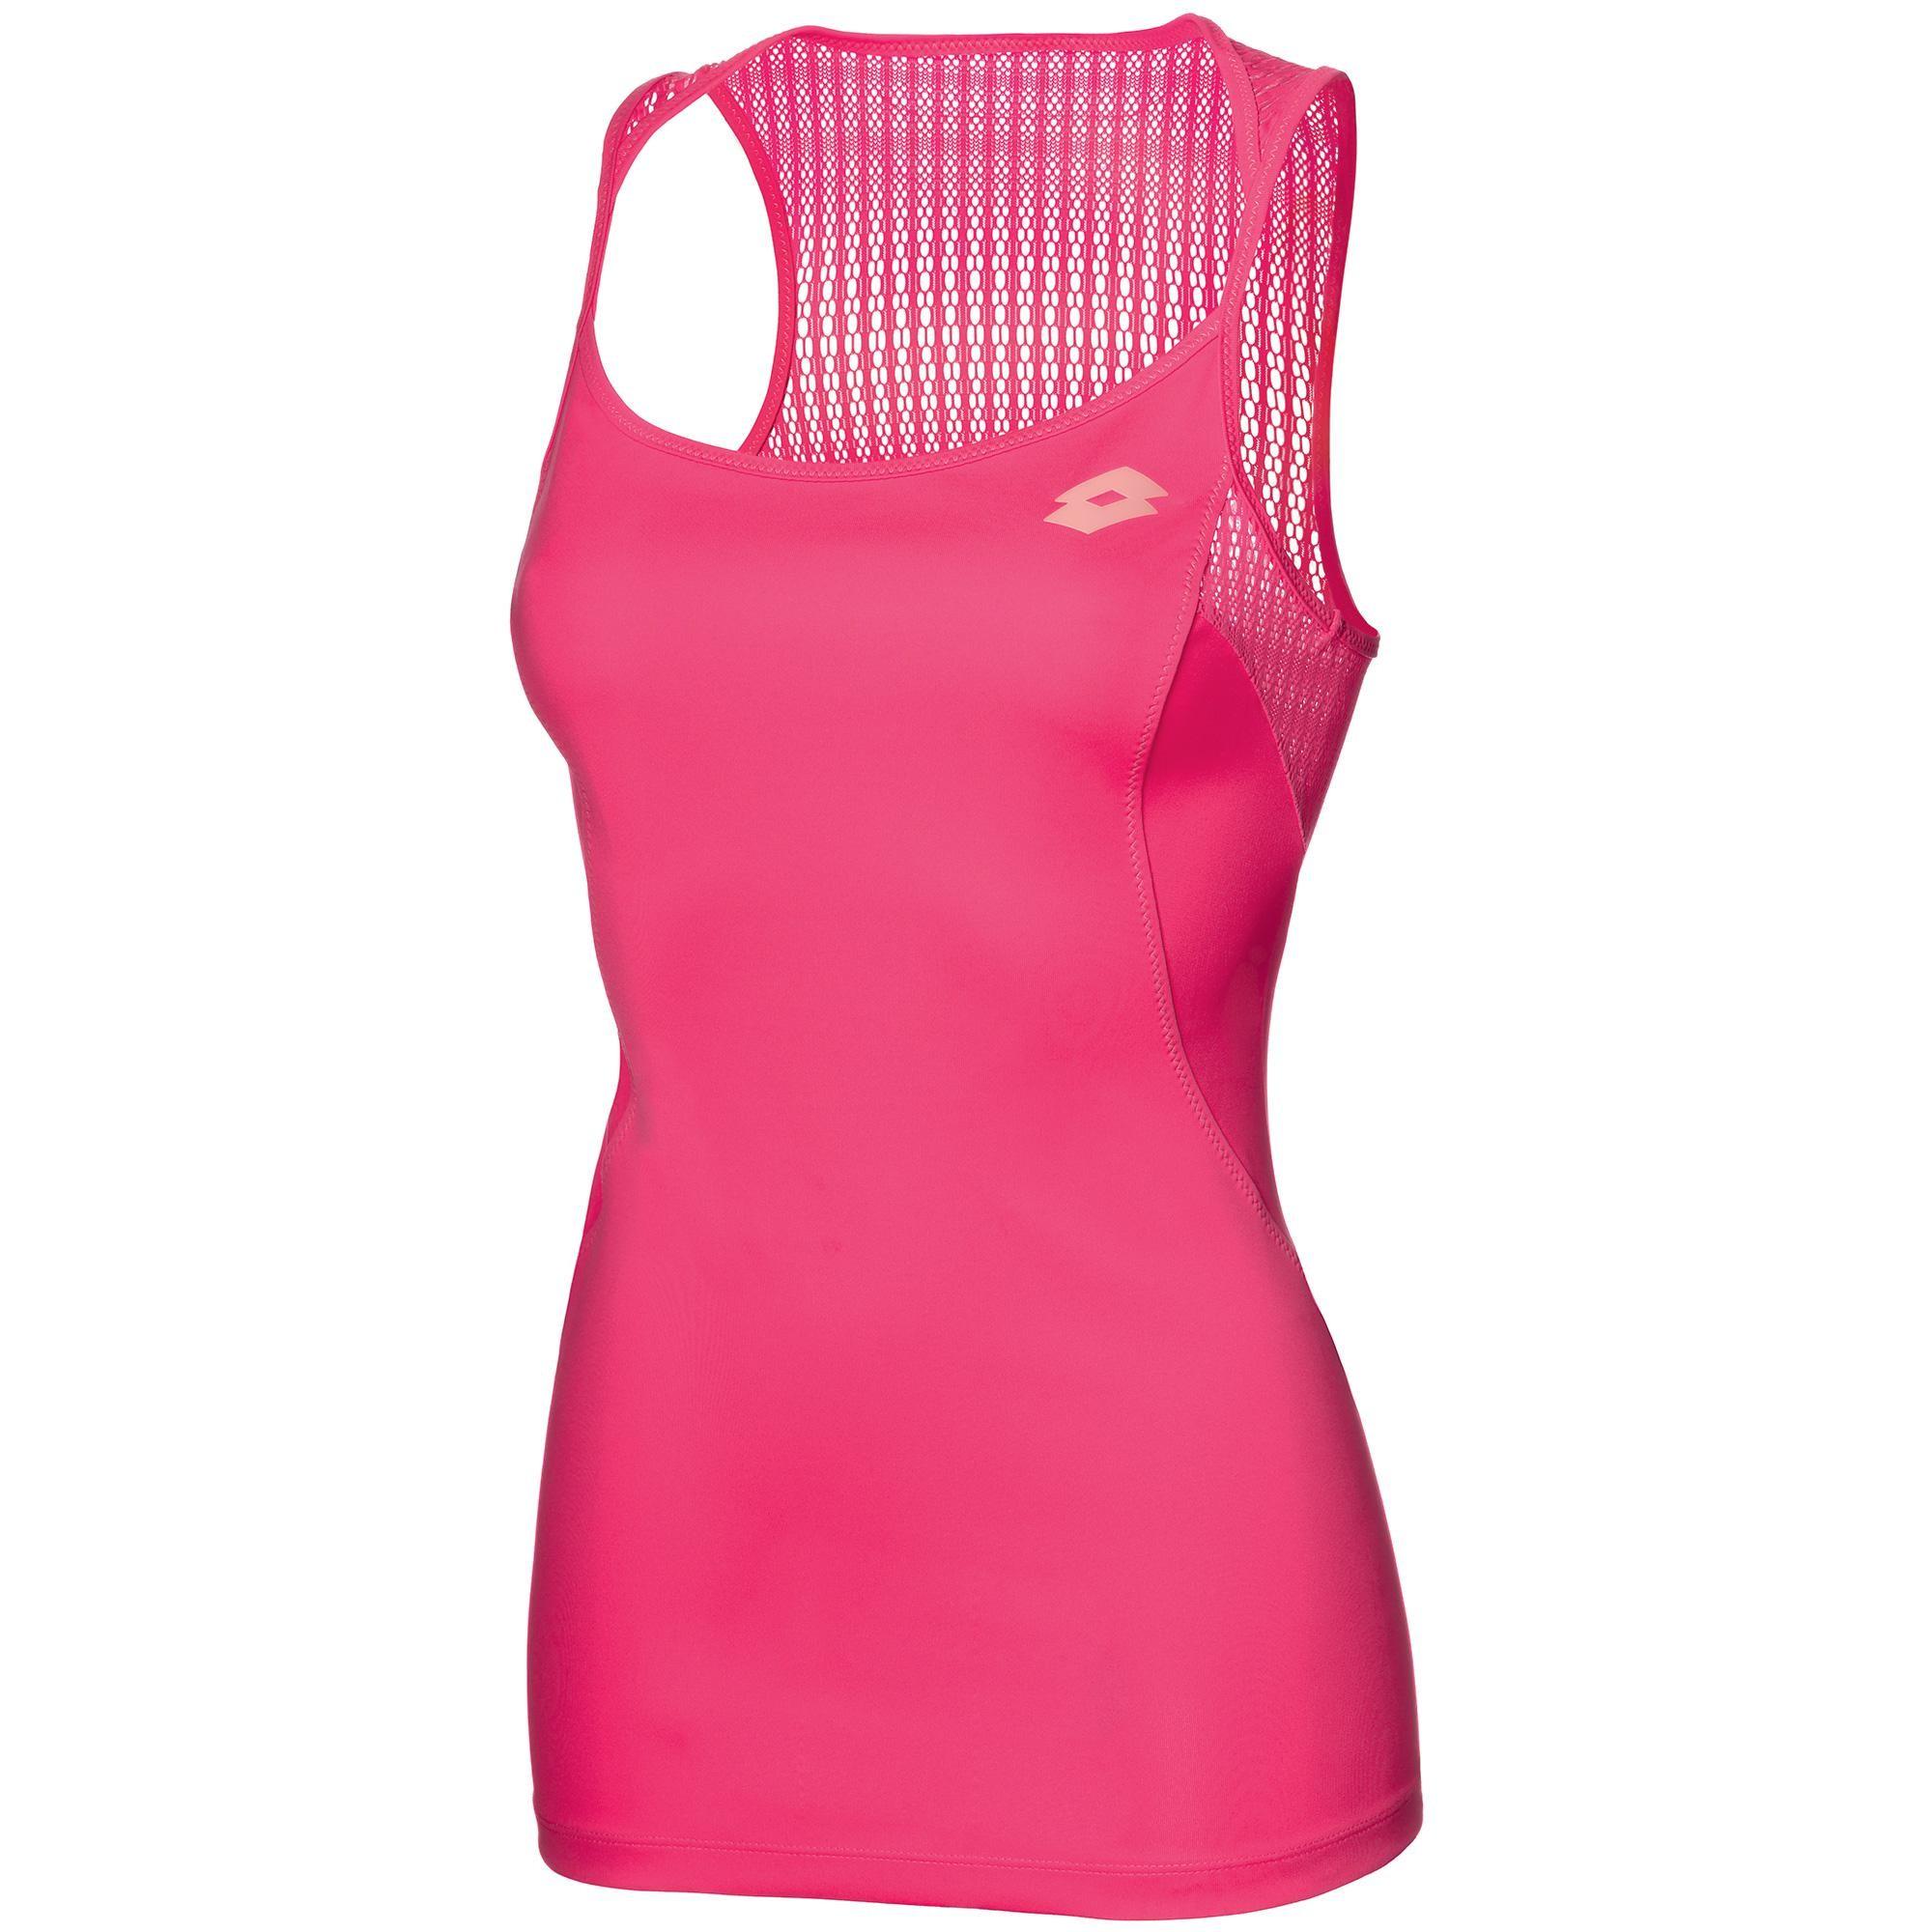 Koszulka tenisowa damska Lotto Nixia II Tank - pink fluo pop - wyprzedaż!